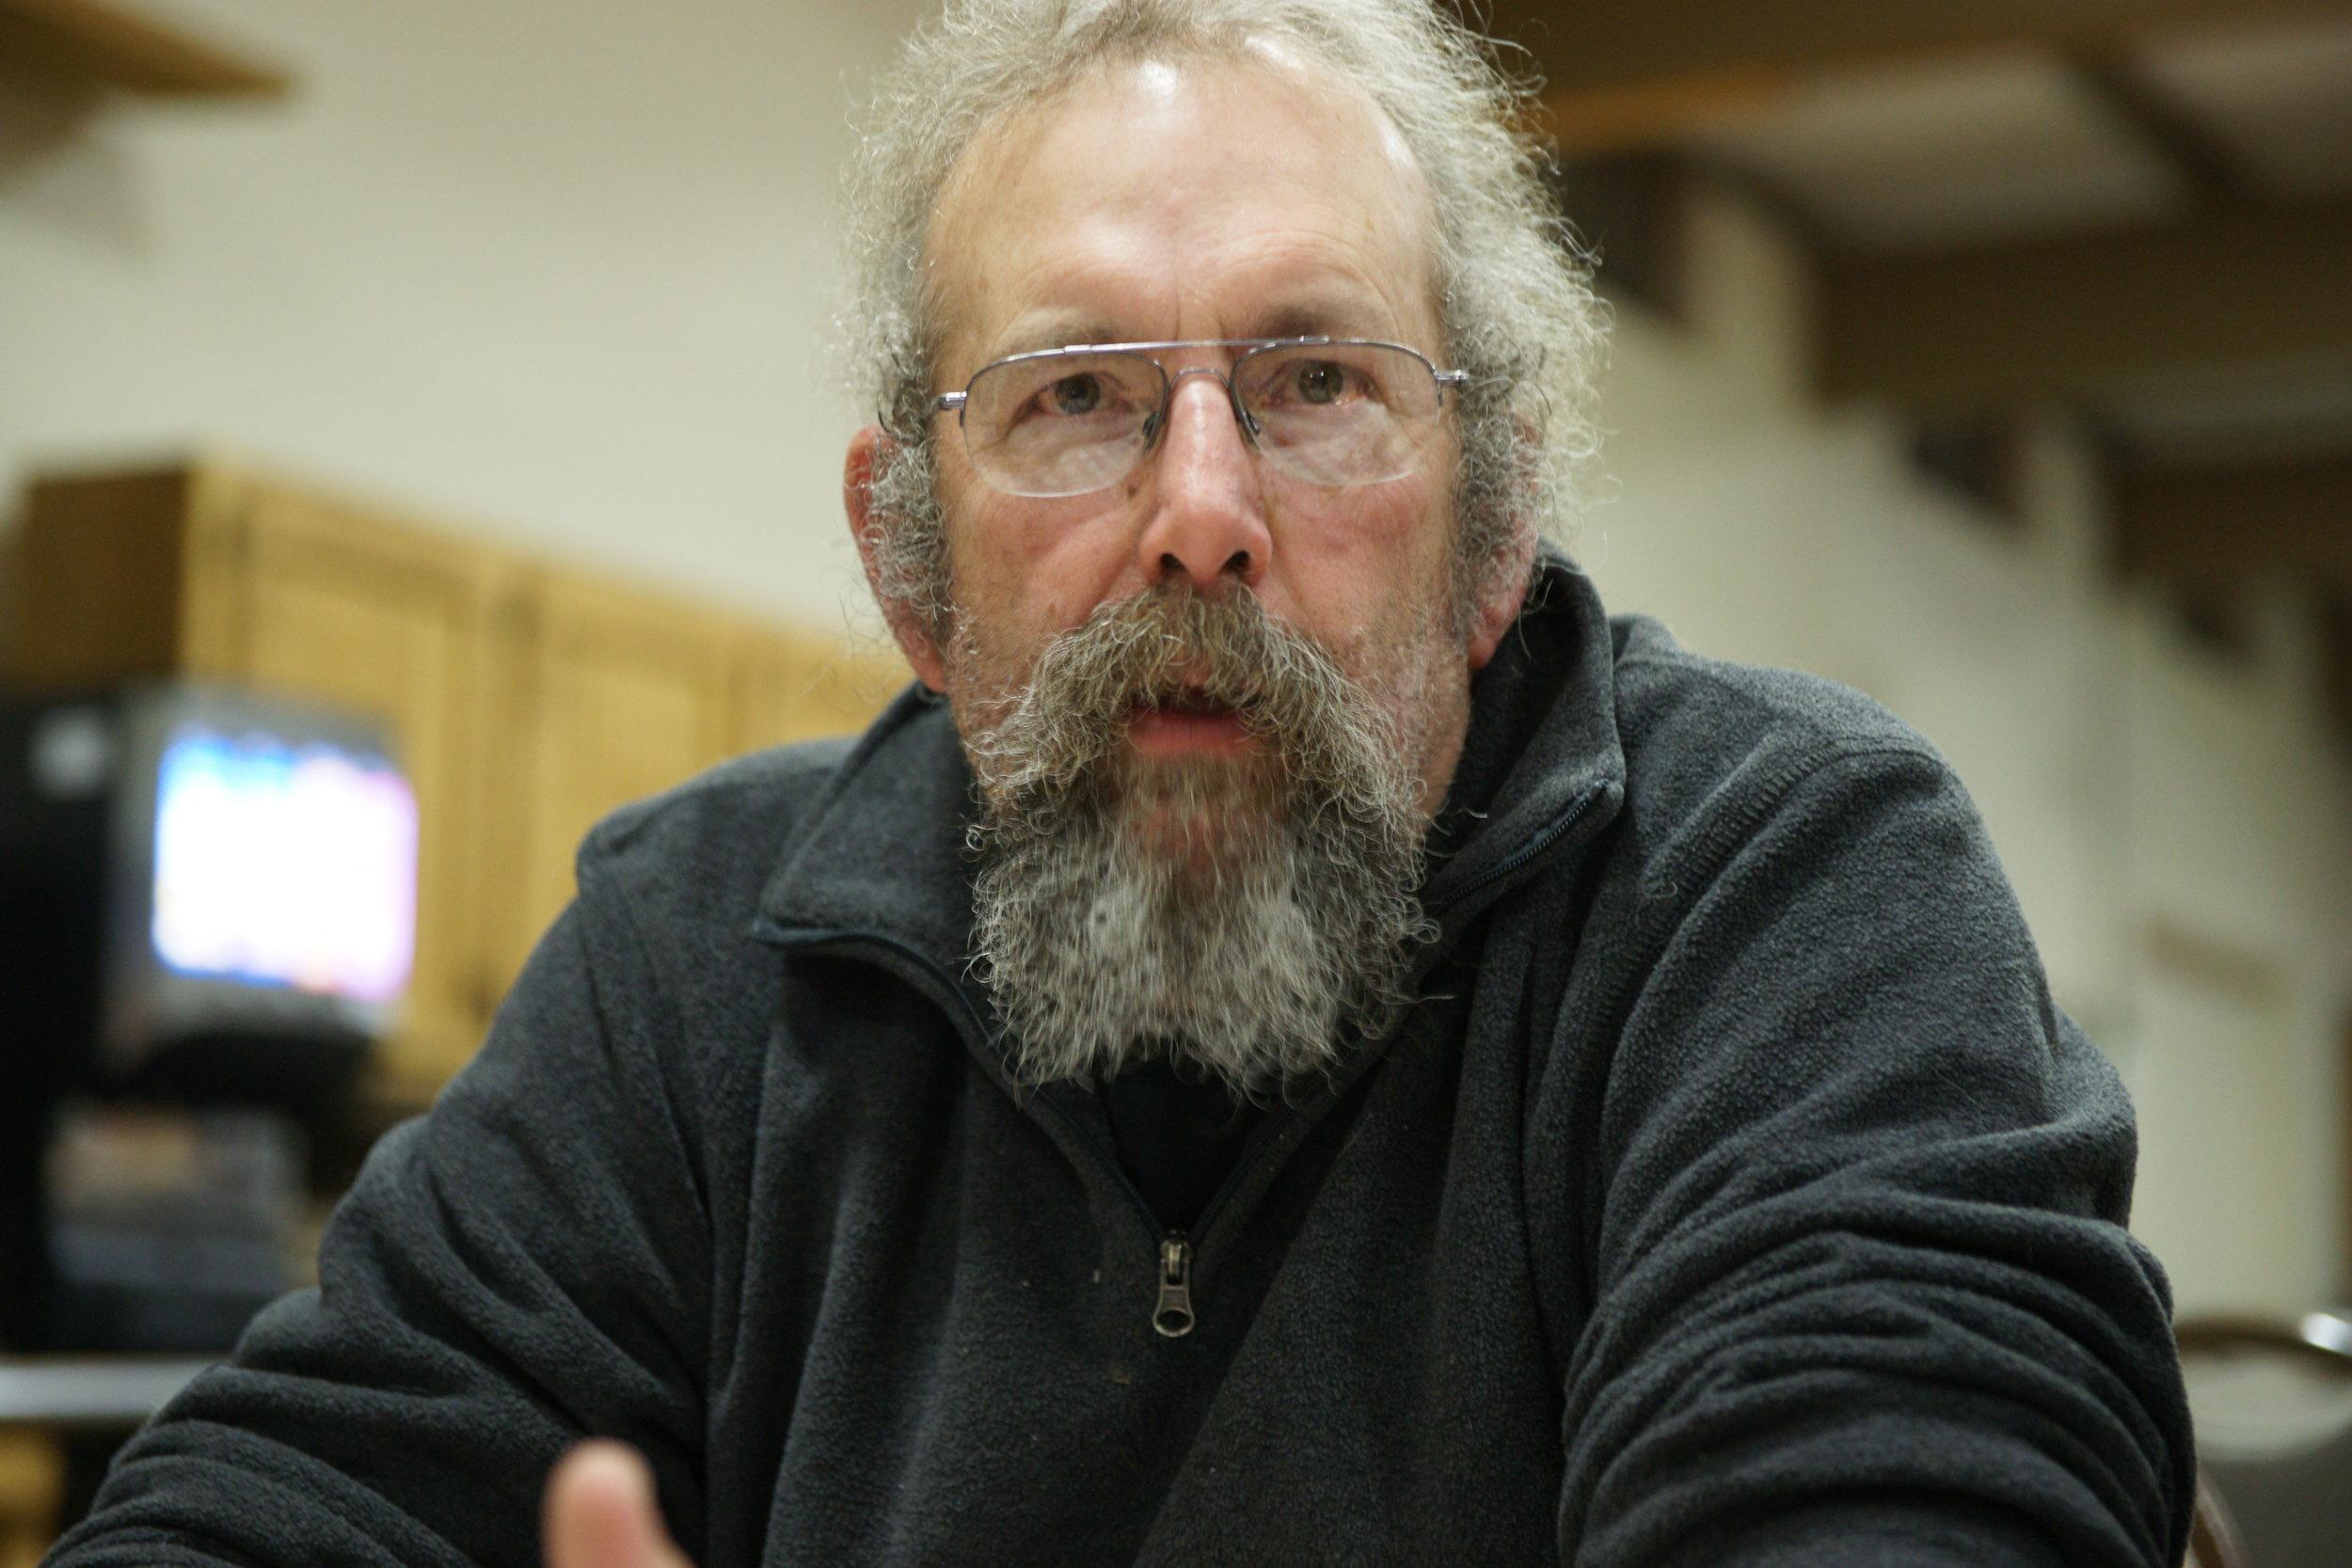 Steve Timm